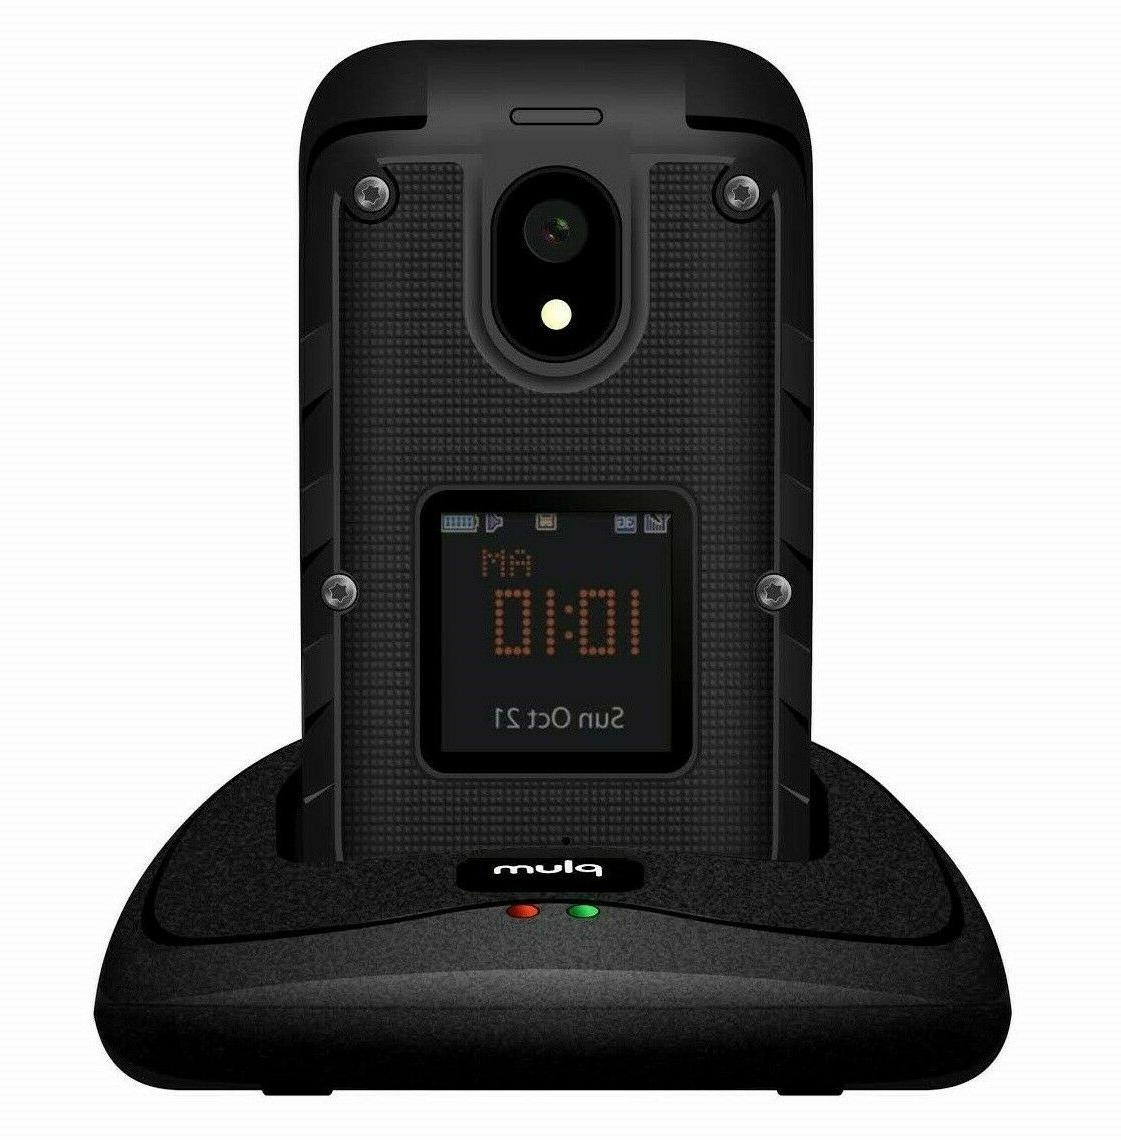 Plum Flip Phone 4G ATT Talk